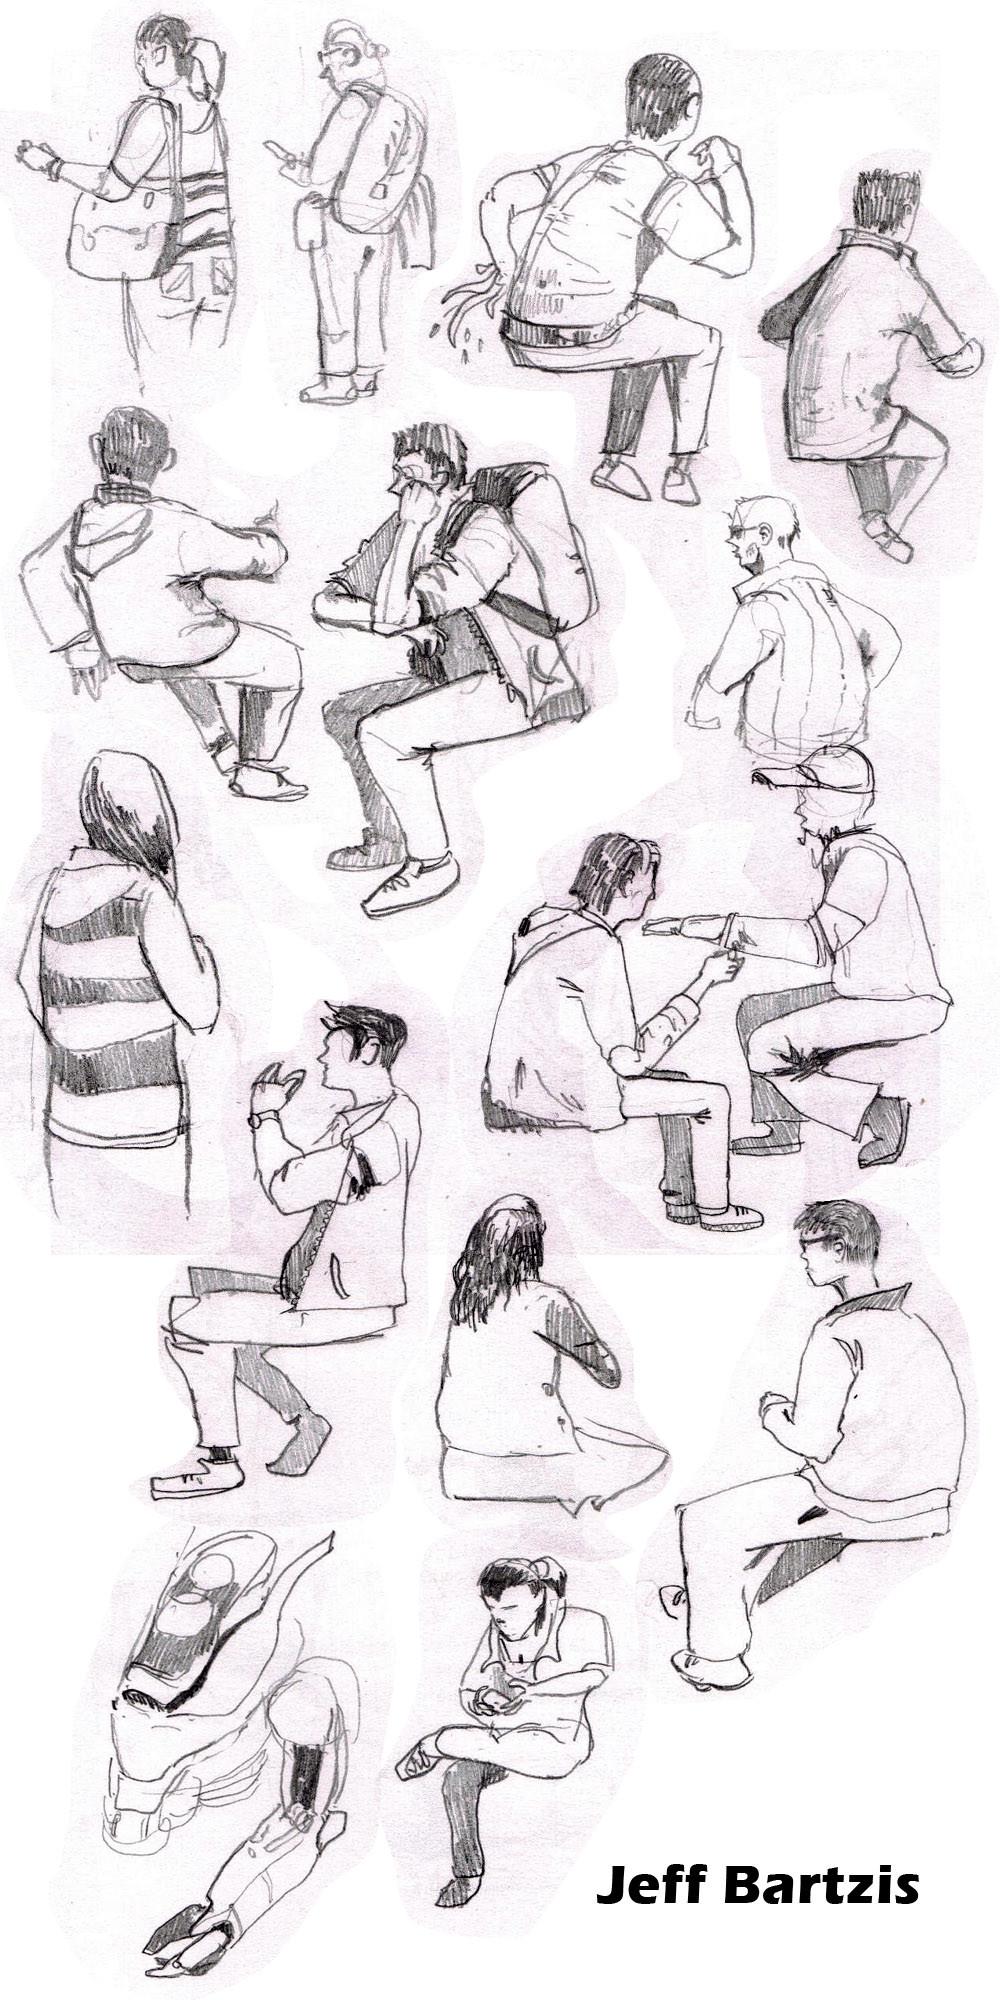 Jeff bartzis sketchbook stuff 035